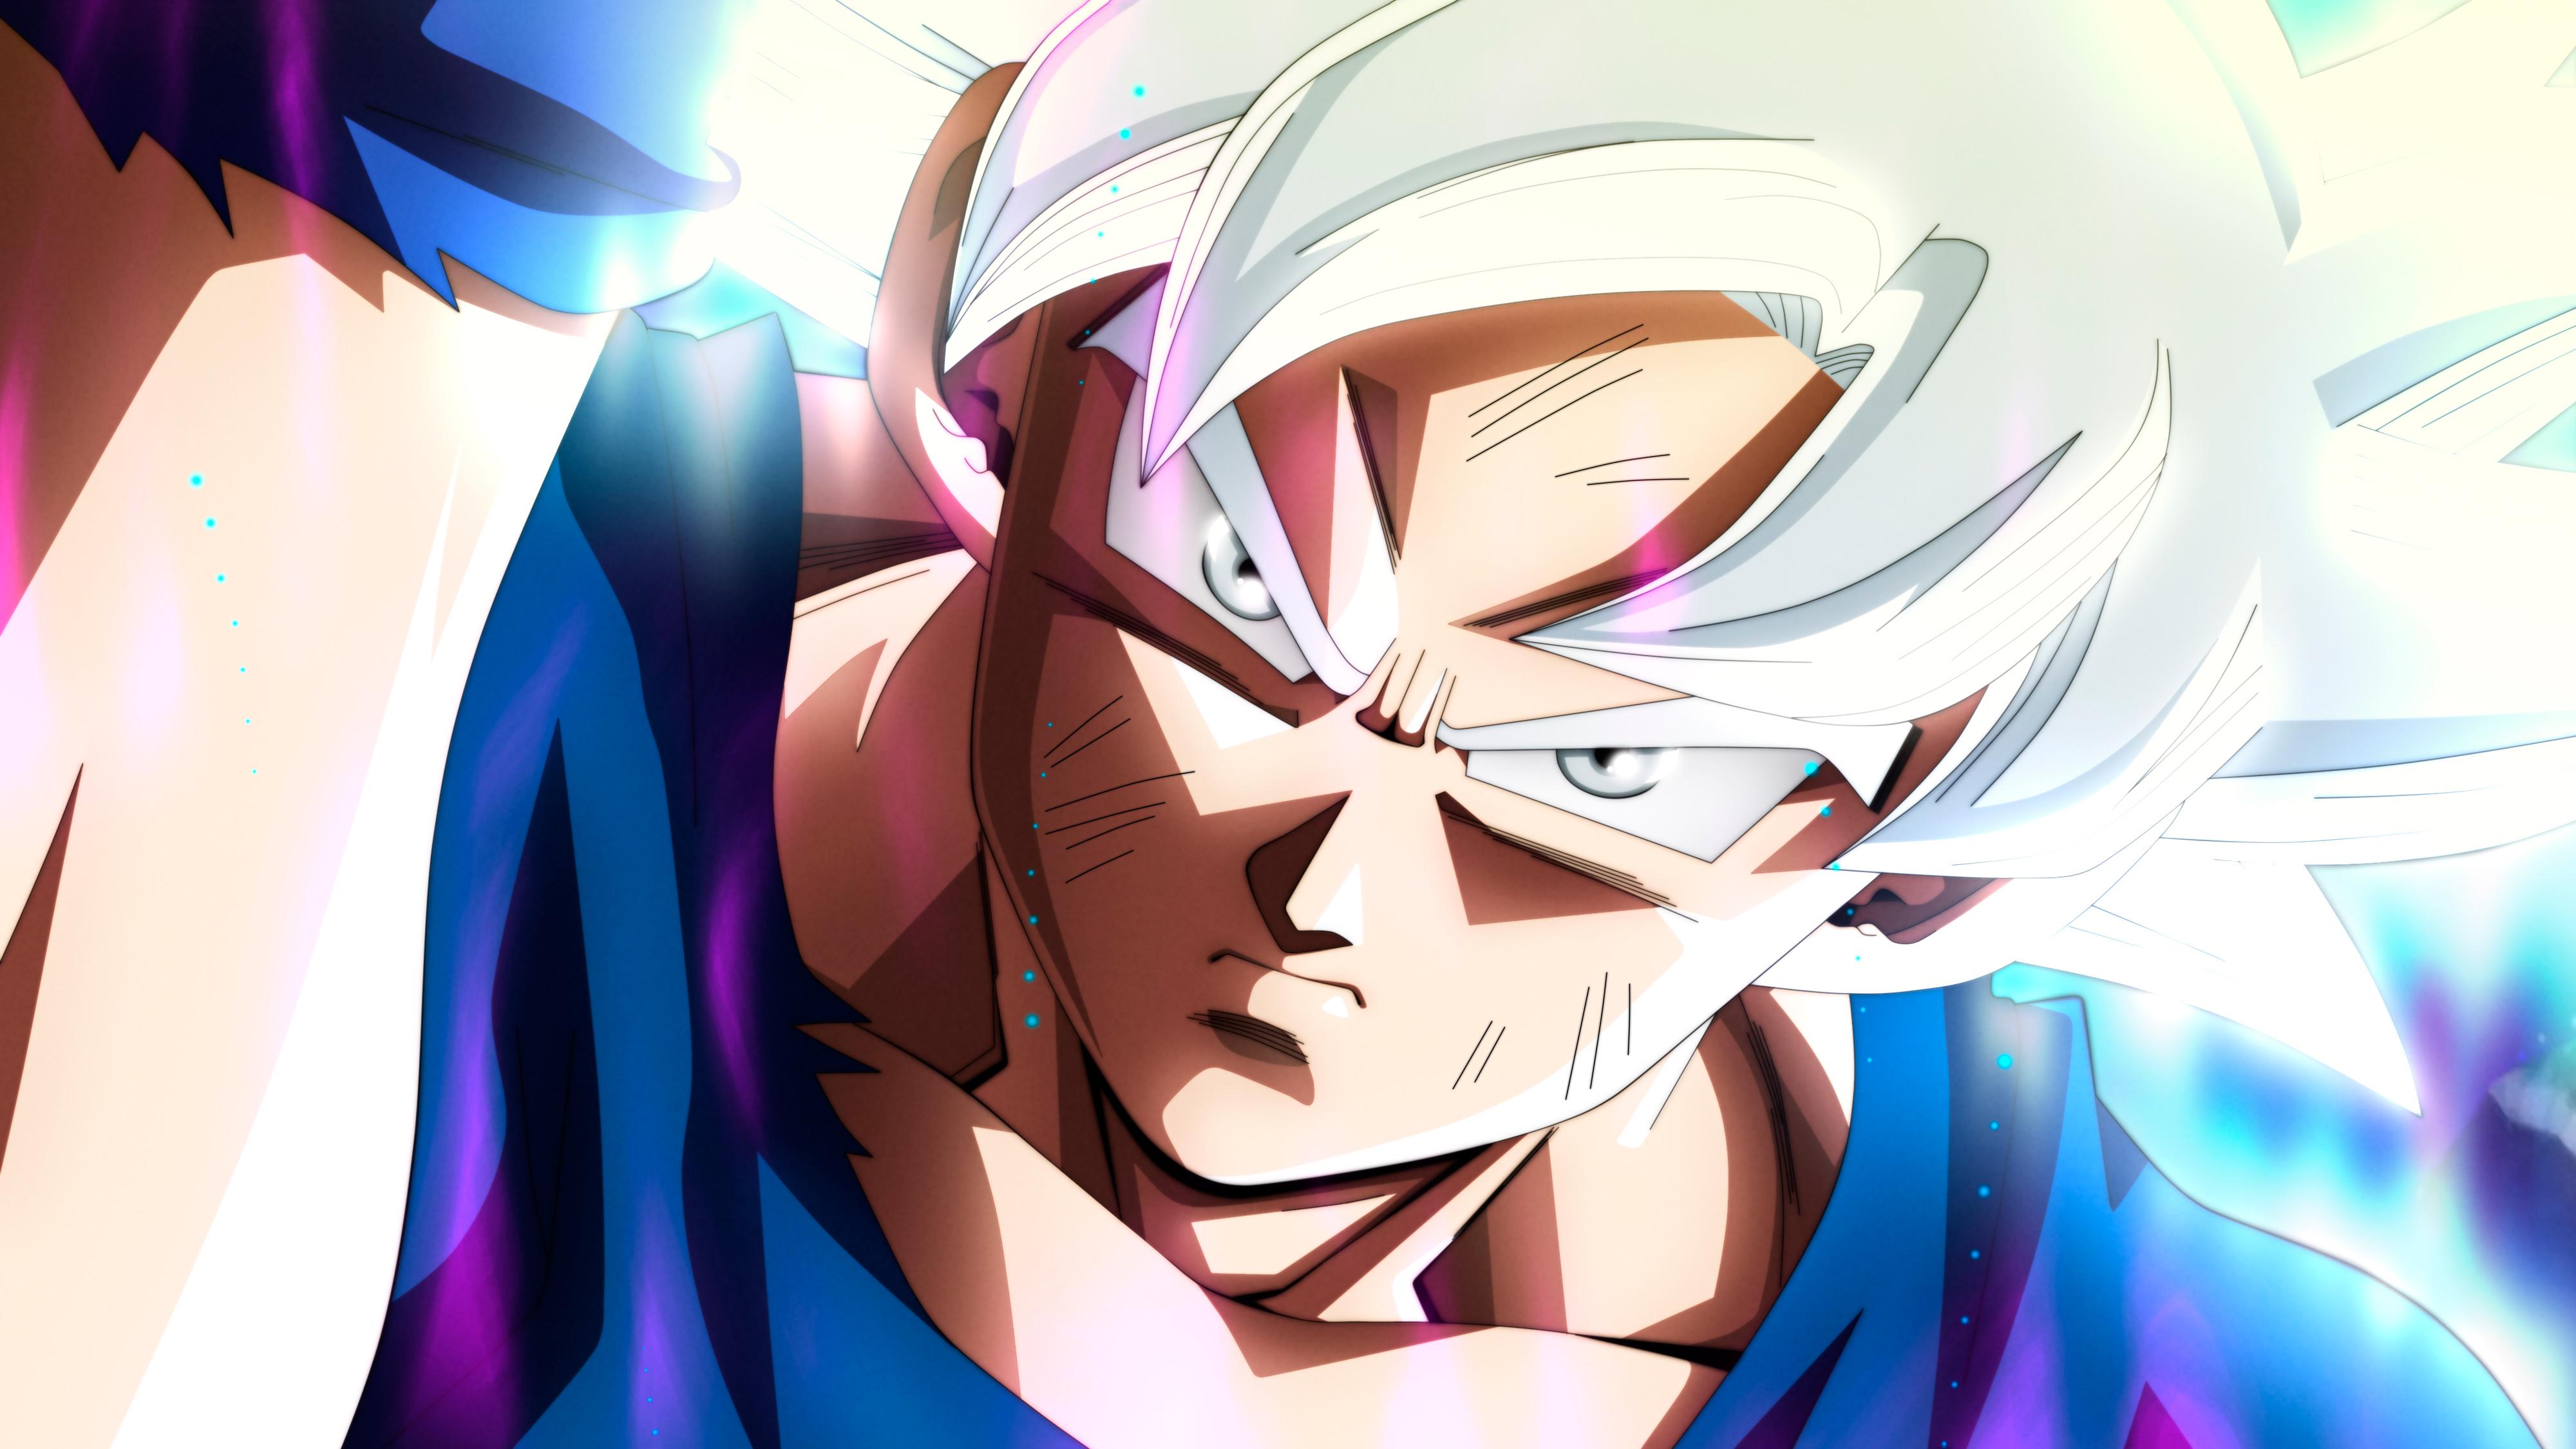 Ultra Instinct Goku Dragon Ball Super 4k Wallpaper Download